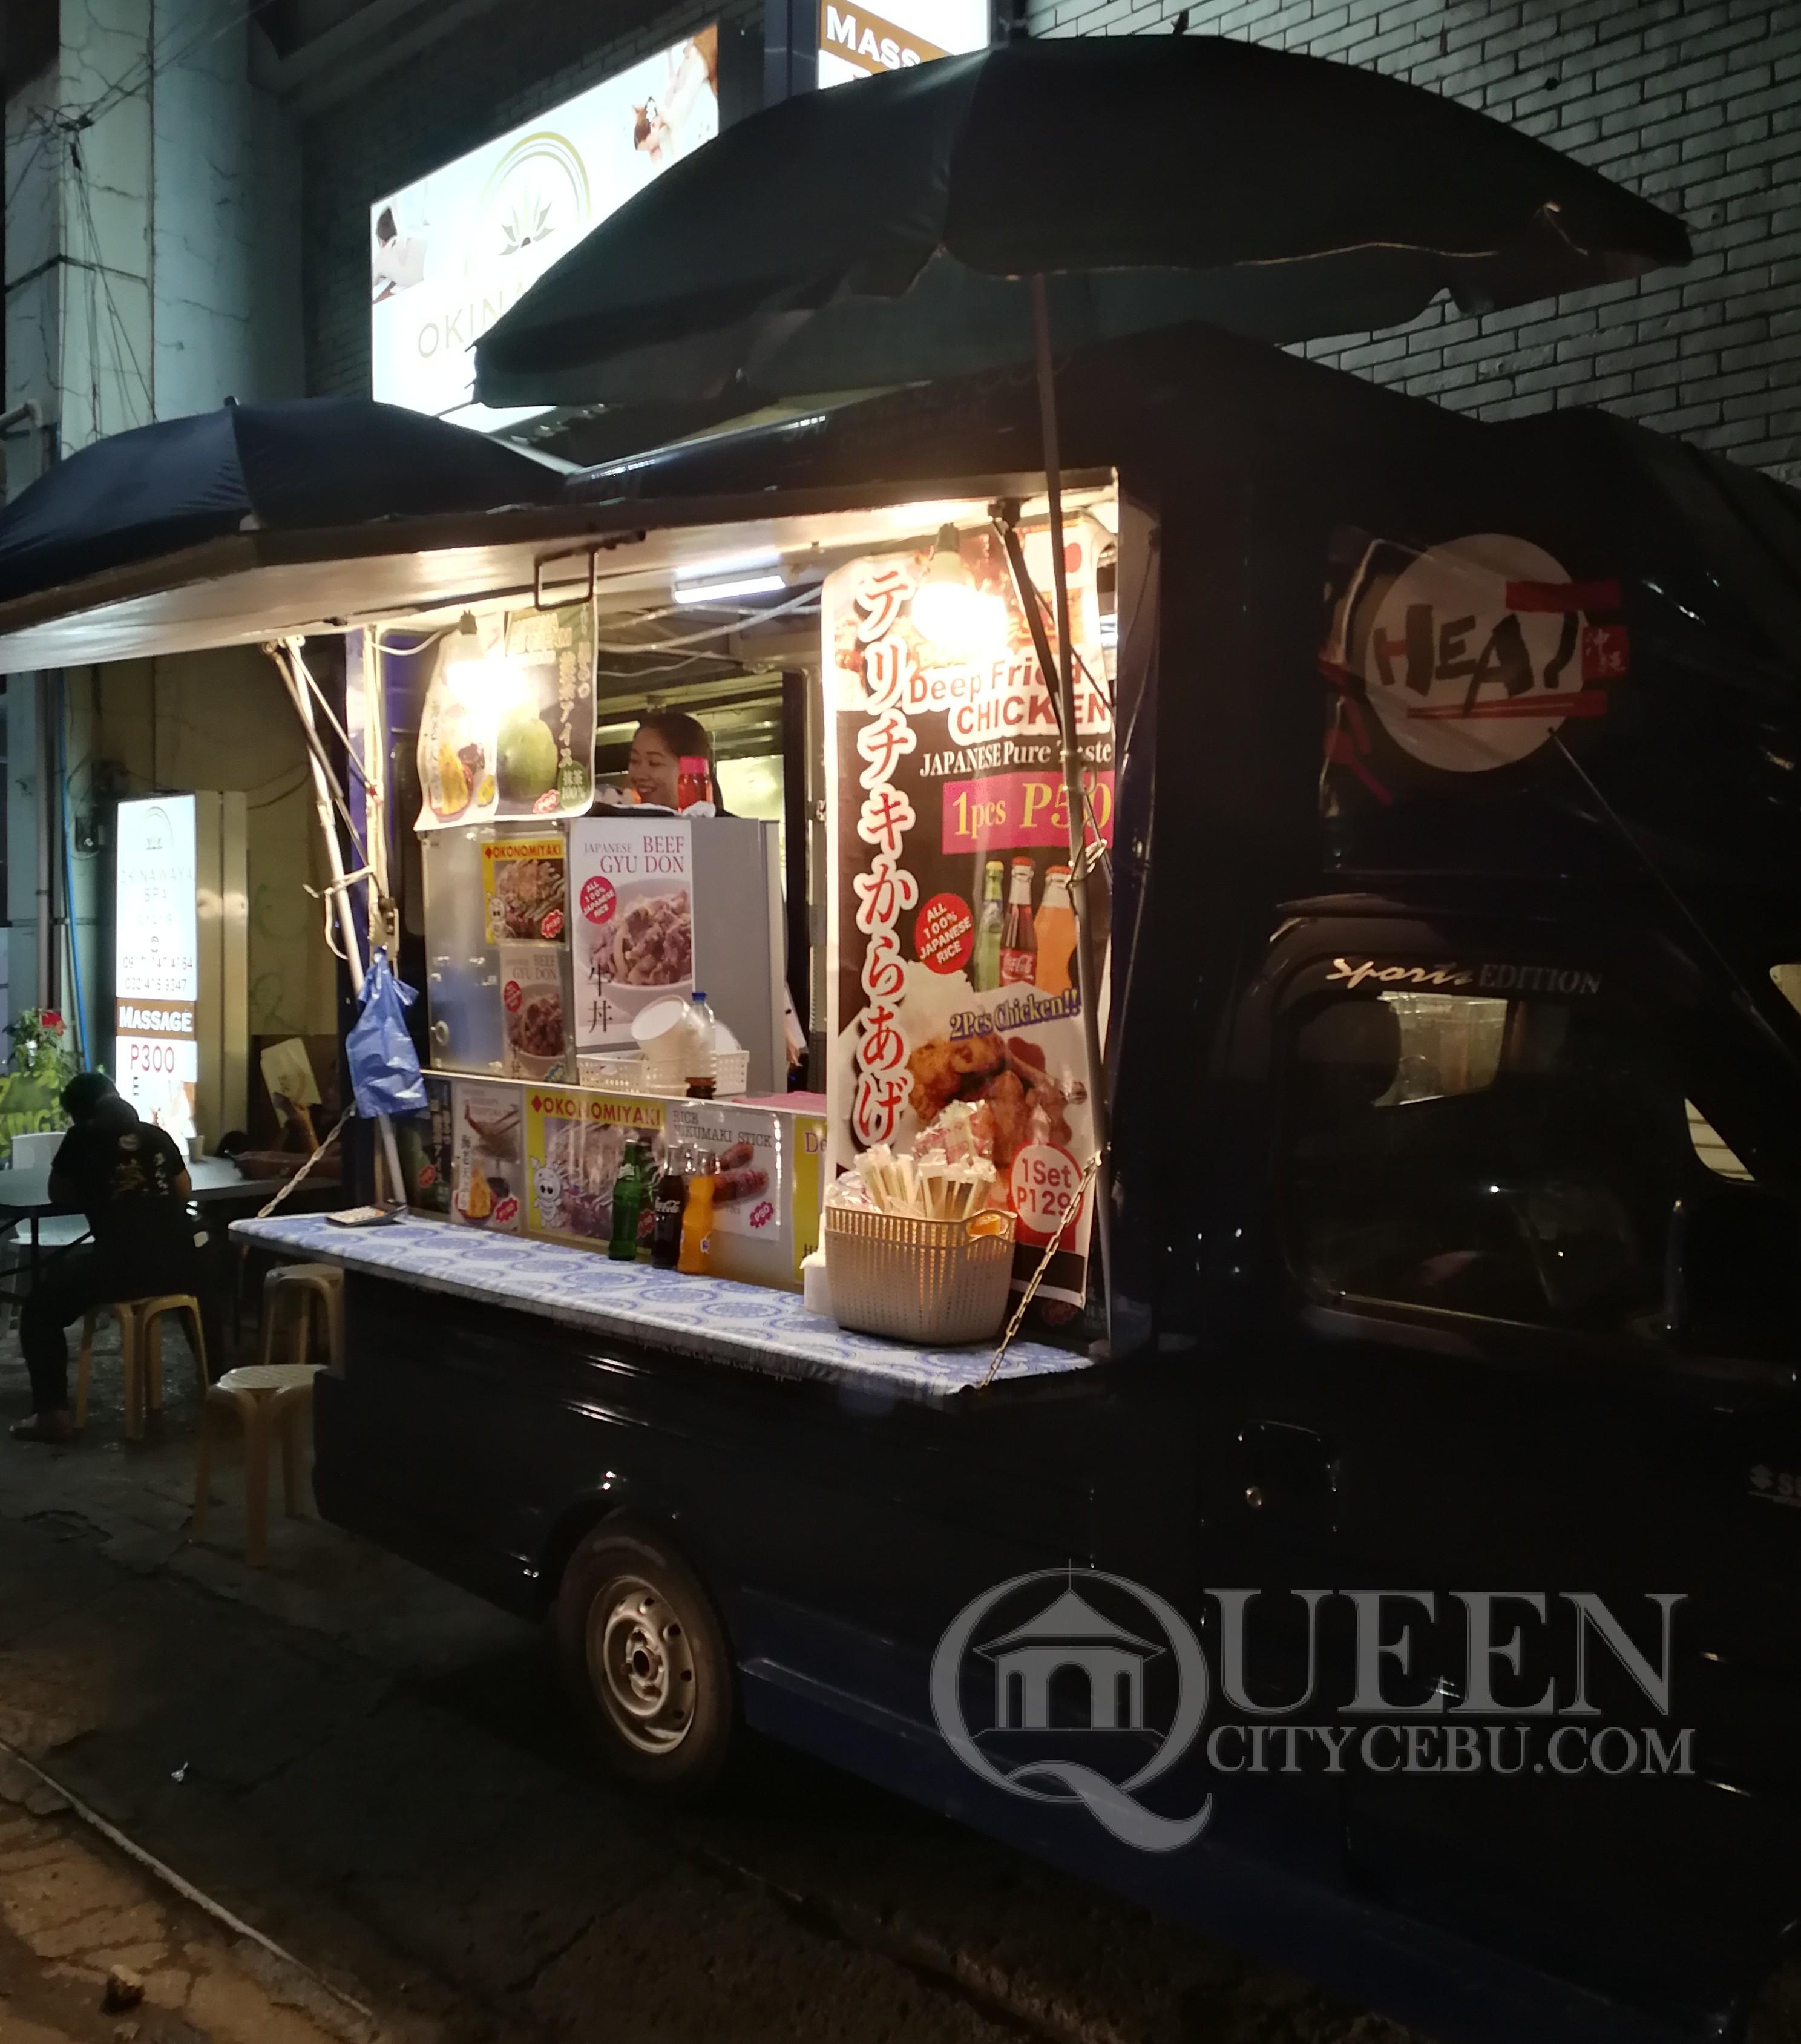 Okinawa Heat Japanese Food Truck Parked infront of Okinawa Spa